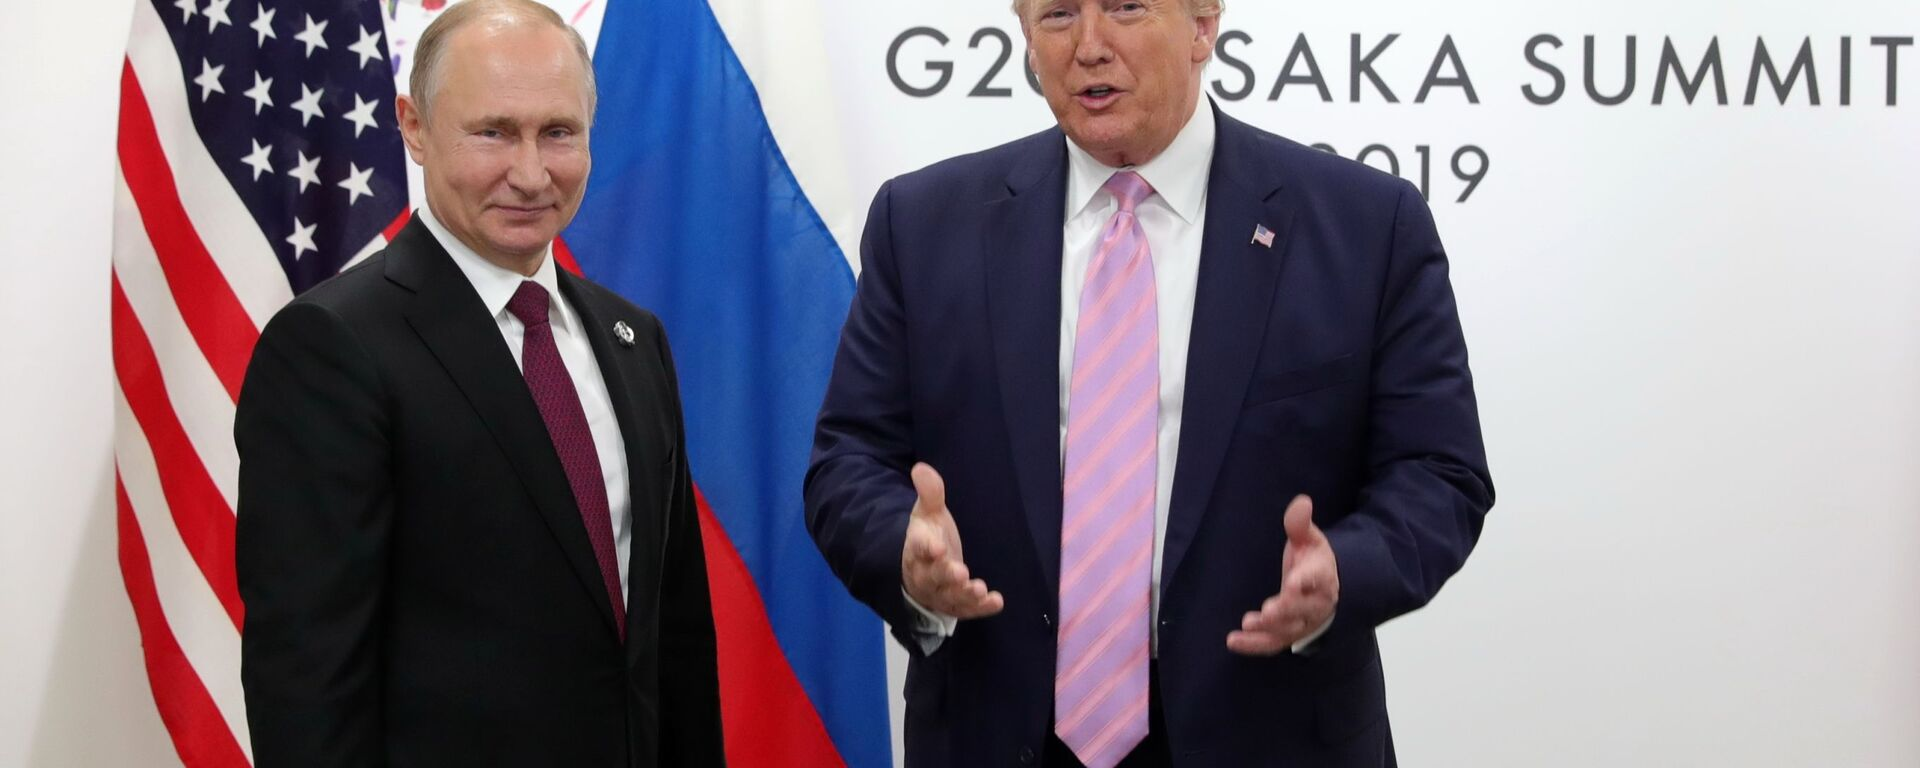 Президент РФ Владимир Путин и президент США Дональд Трамп - Sputnik Таджикистан, 1920, 29.09.2021